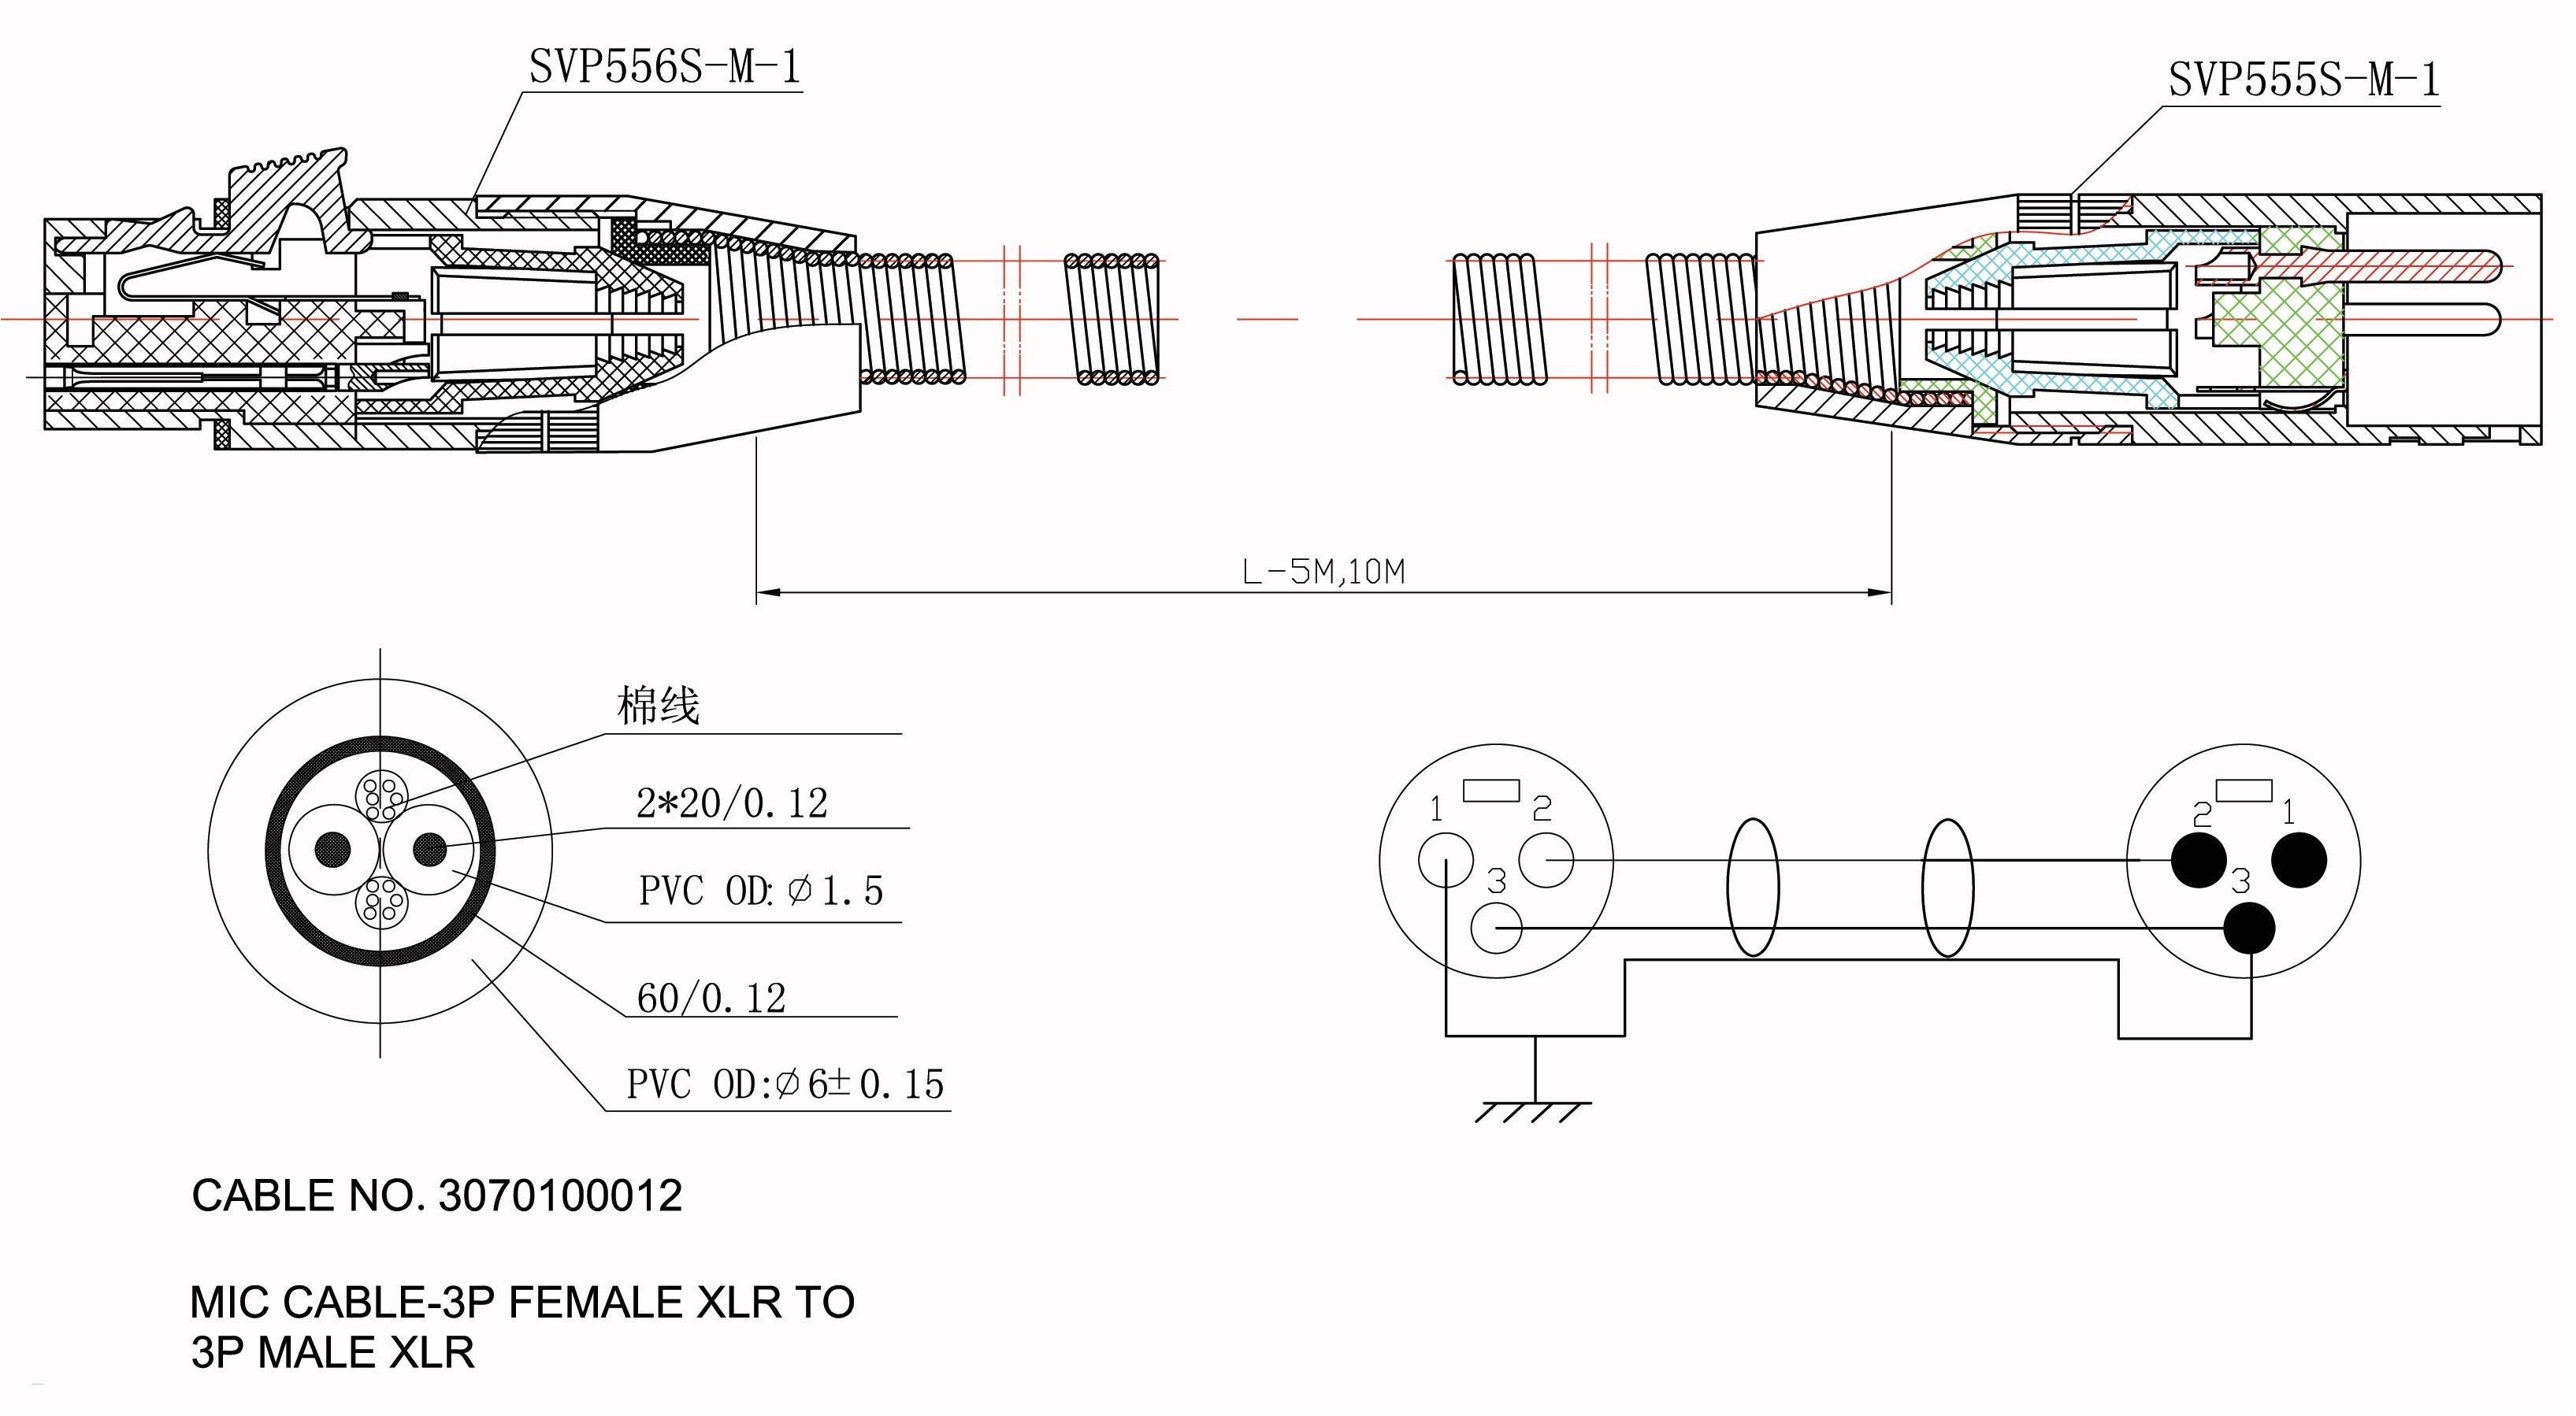 single phase 220v wiring diagram beautiful wiring diagram inverter omron refrence energy saving 220v single jpg